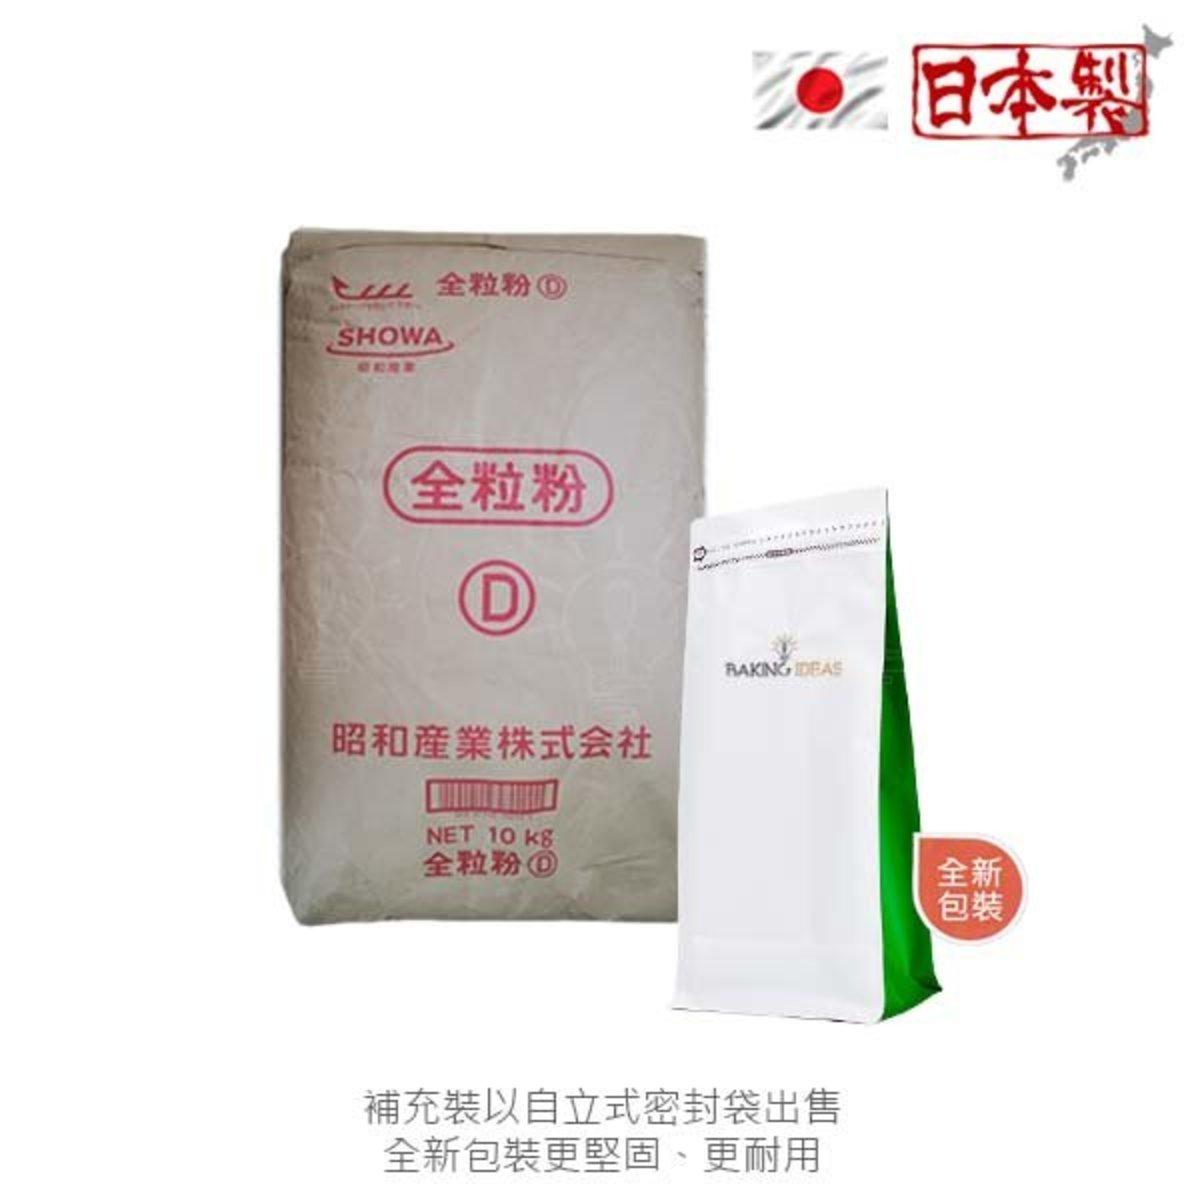 Wheat Flour - Whole Wheat D (Fine) - 1kg (Refill Package)